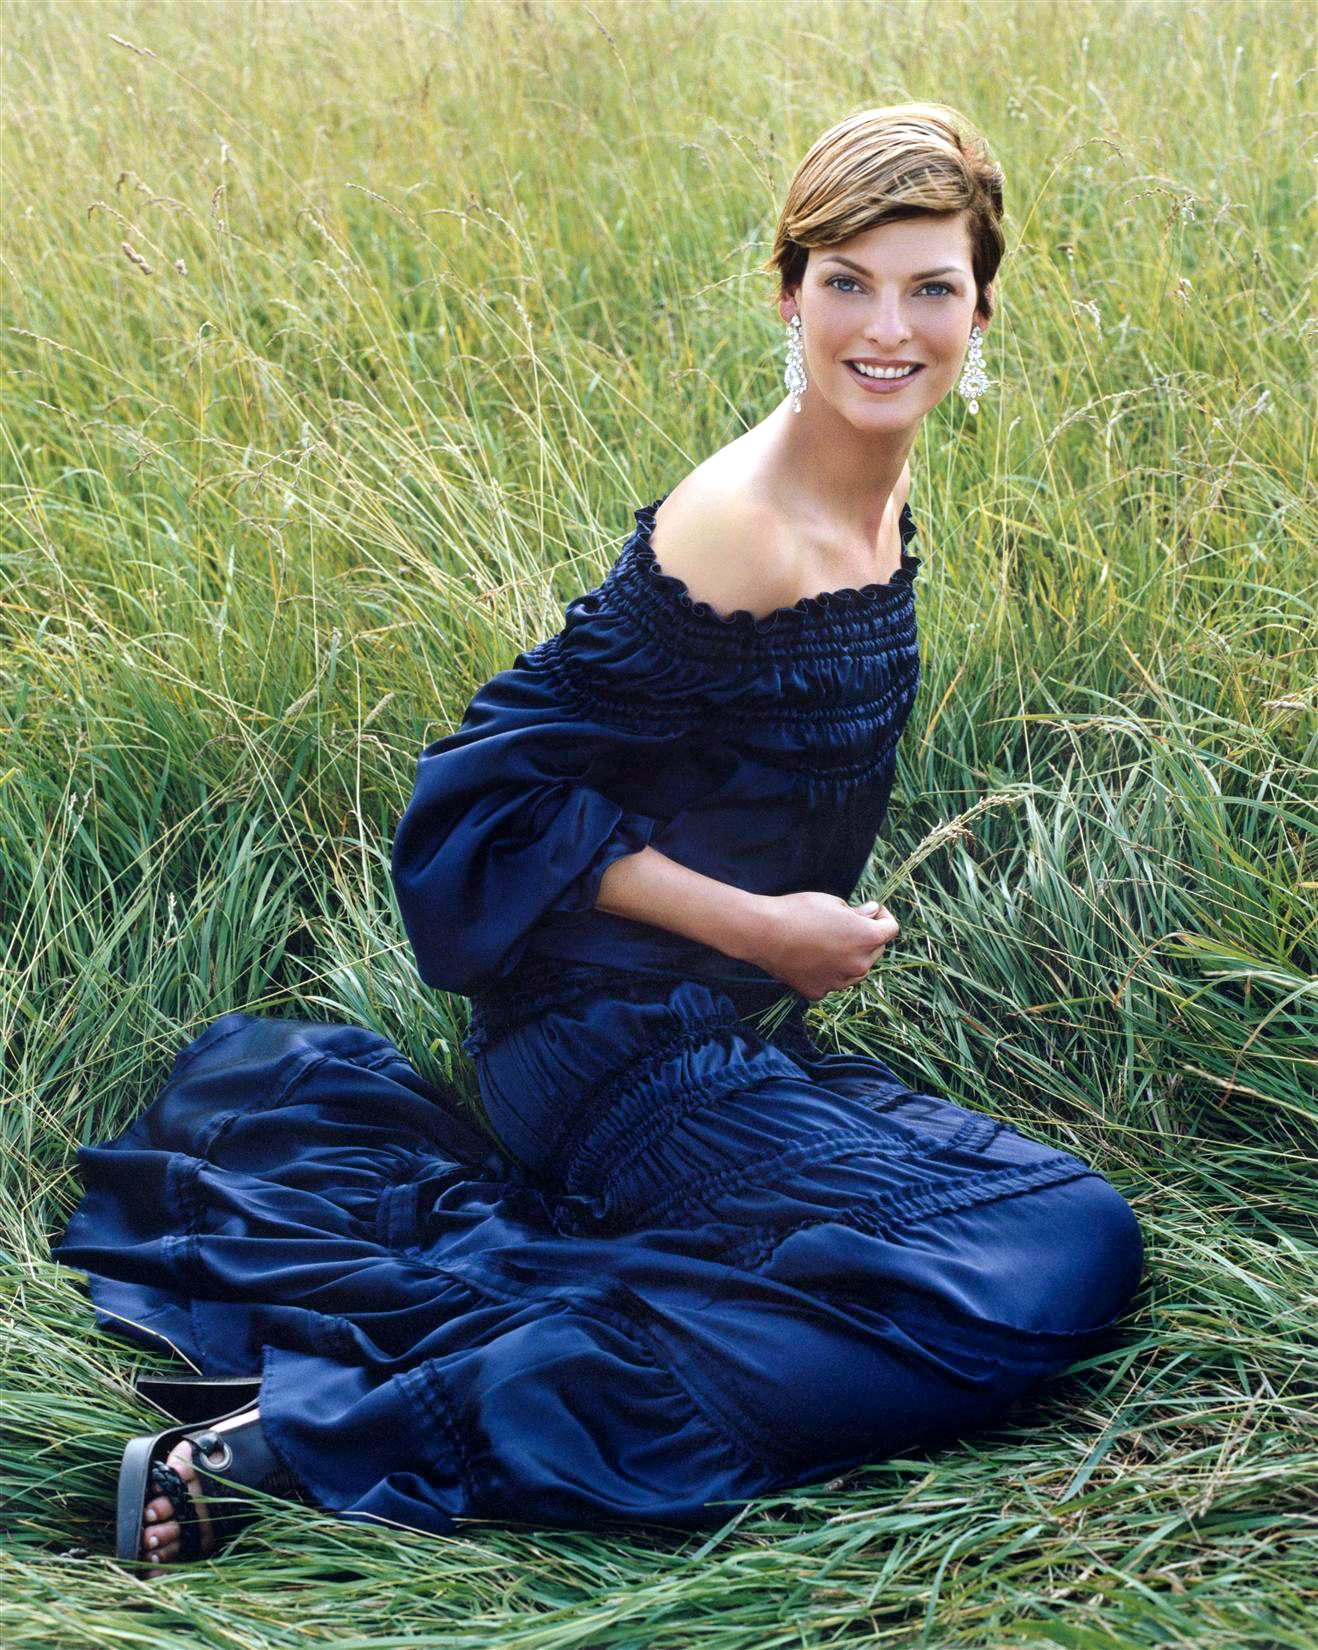 TFOTD: Linda Evangelista for Vogue 2001 featured image